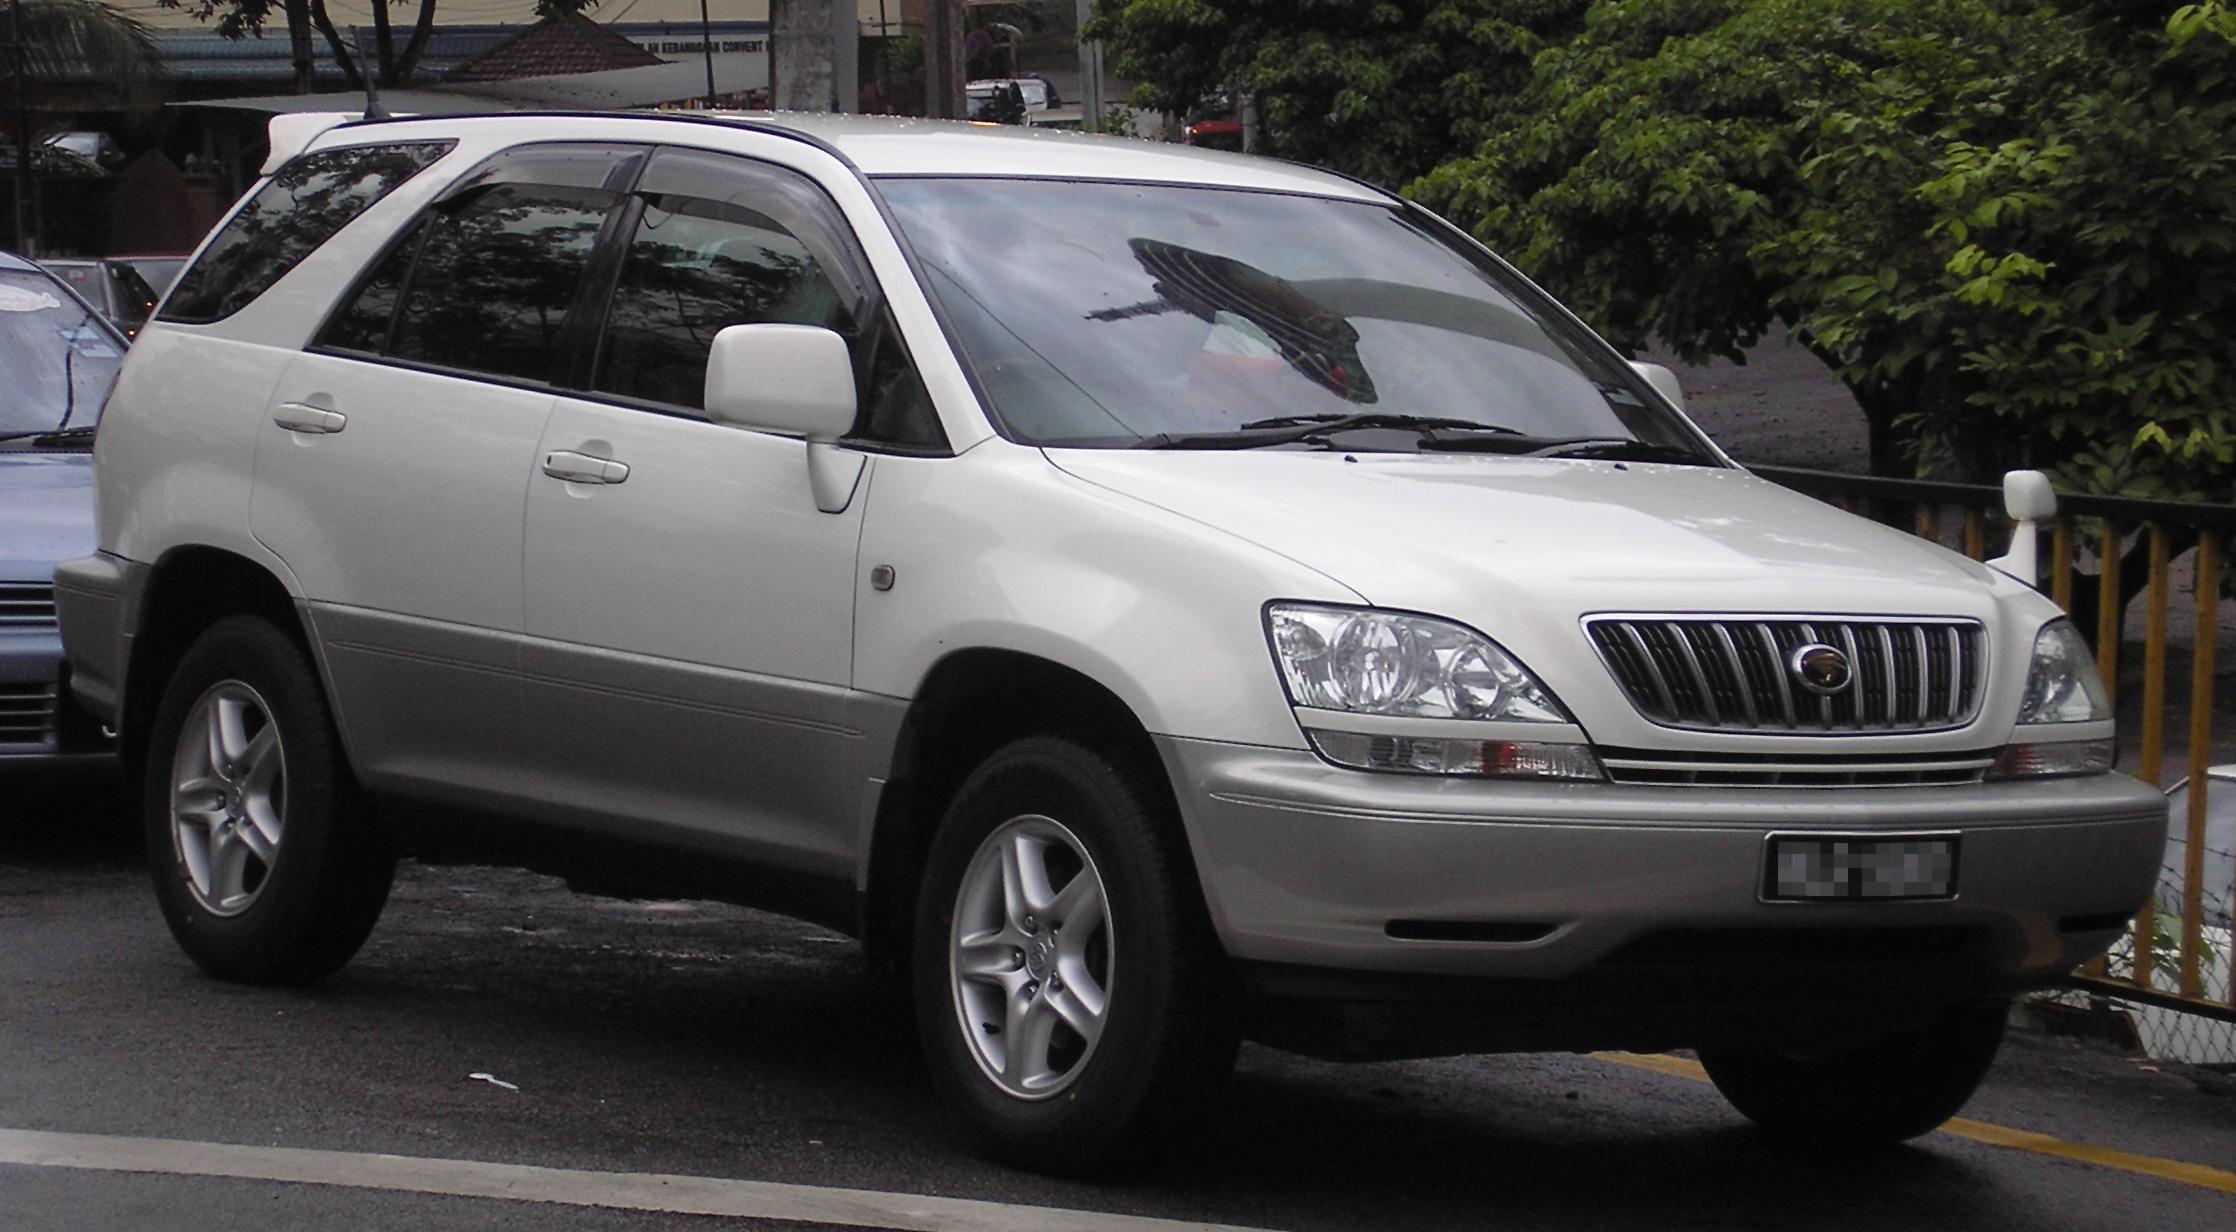 Used Cars For Sale Malaysia Kuala Lumpur